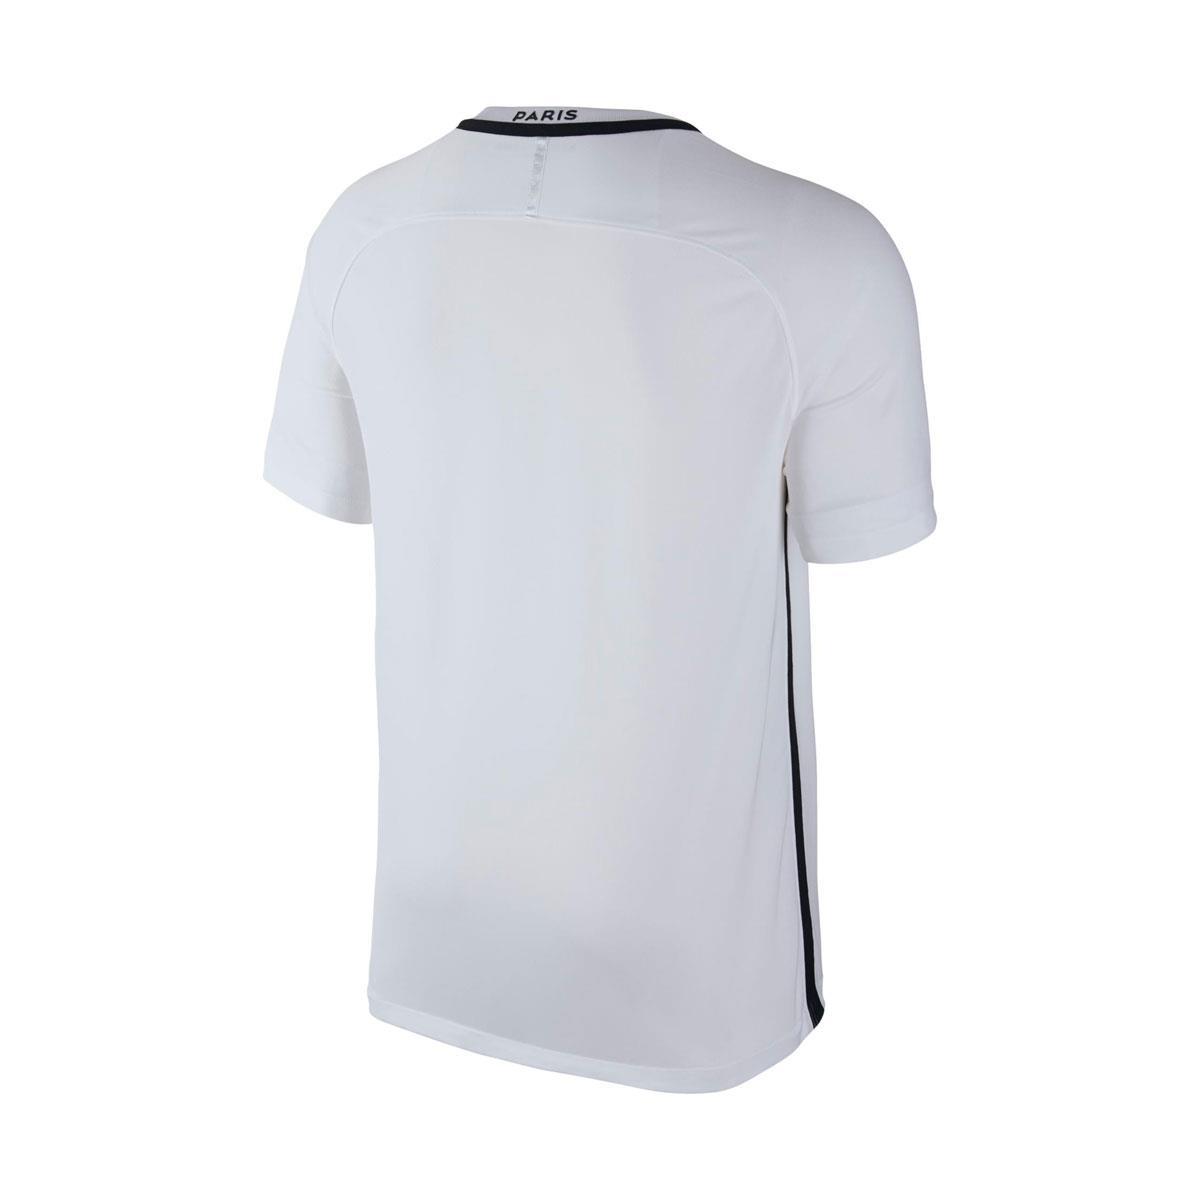 1acb6618bfbd3 Camisa NiKe PSG III Torcedor 2016 2017 Branca